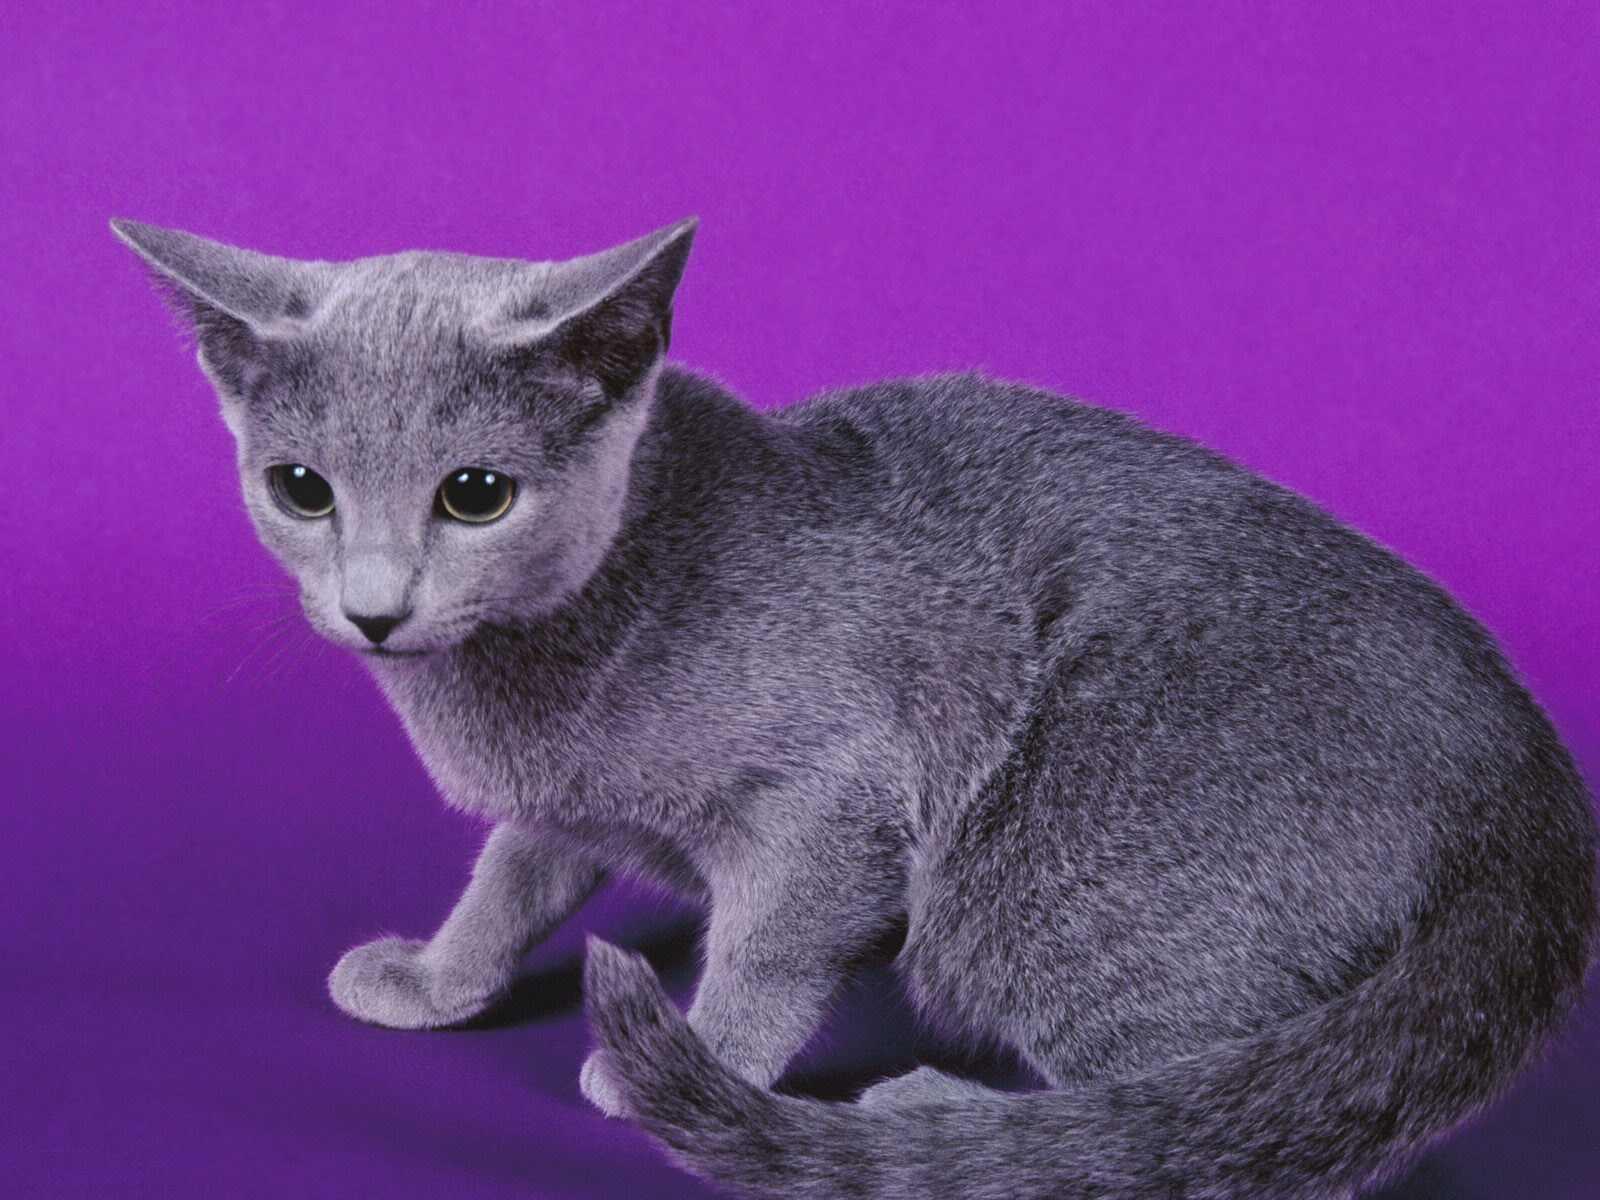 Gatos Cats Mascotas Wallpapers Fondos De Pantalla Hd